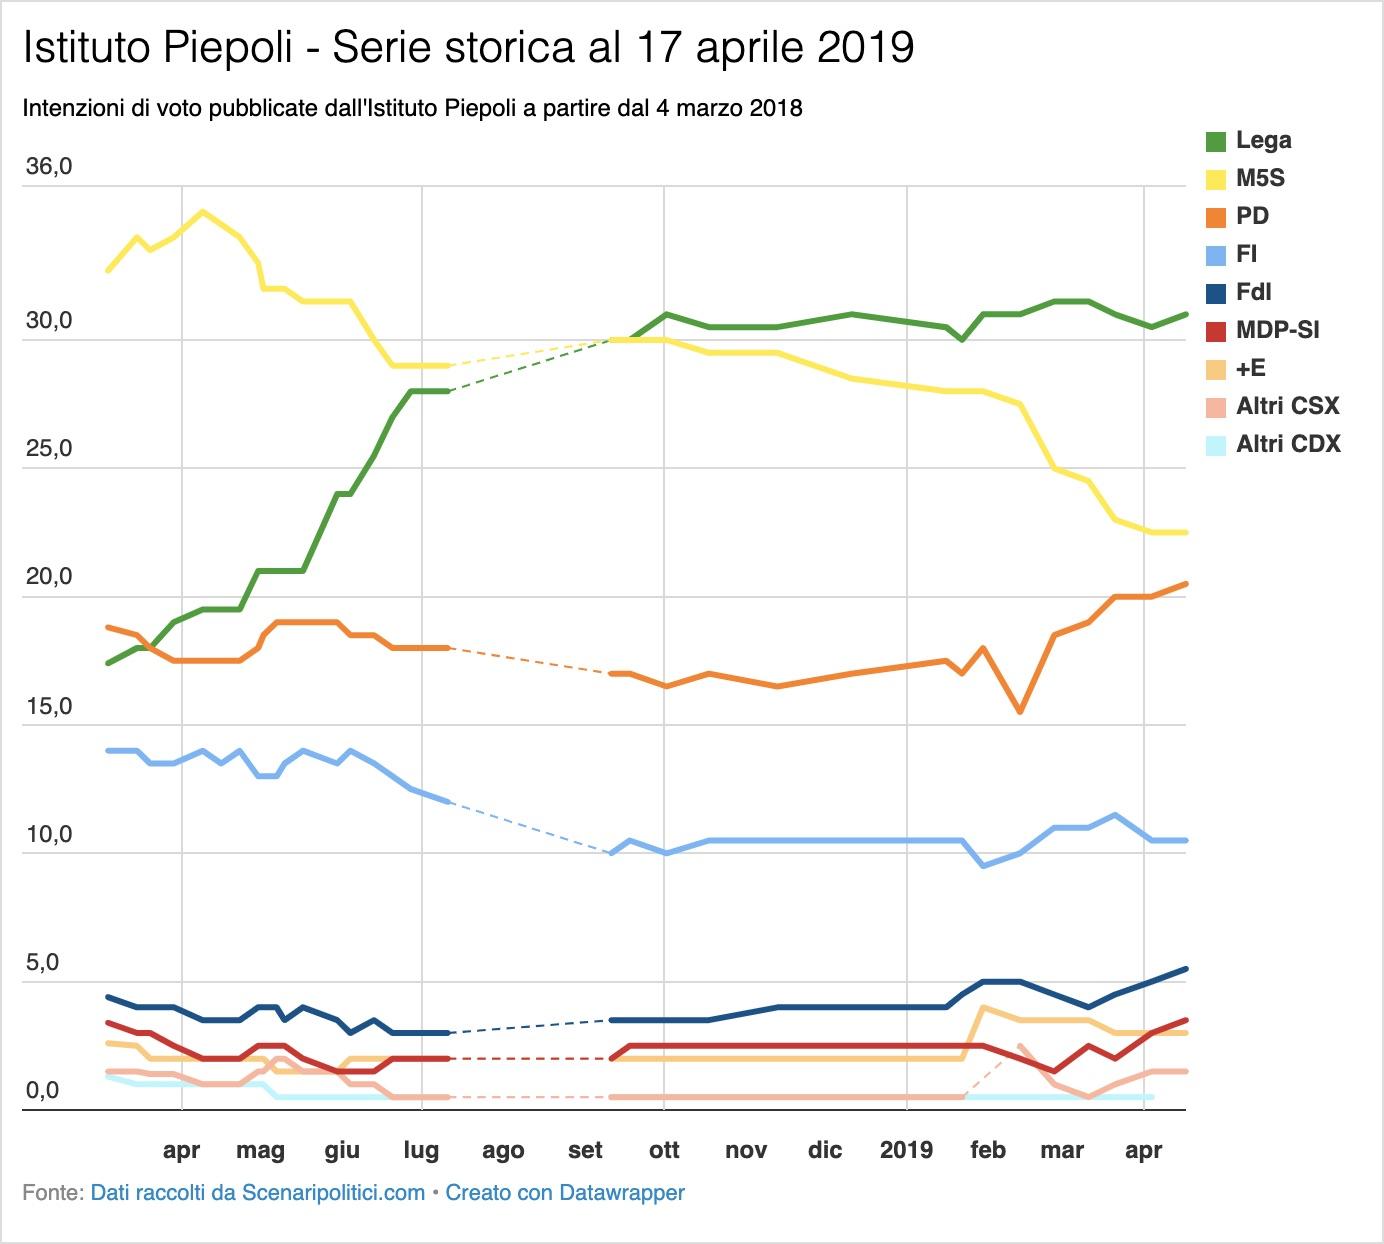 Sondaggi Euromedia Research e Piepoli 17 aprile 2019